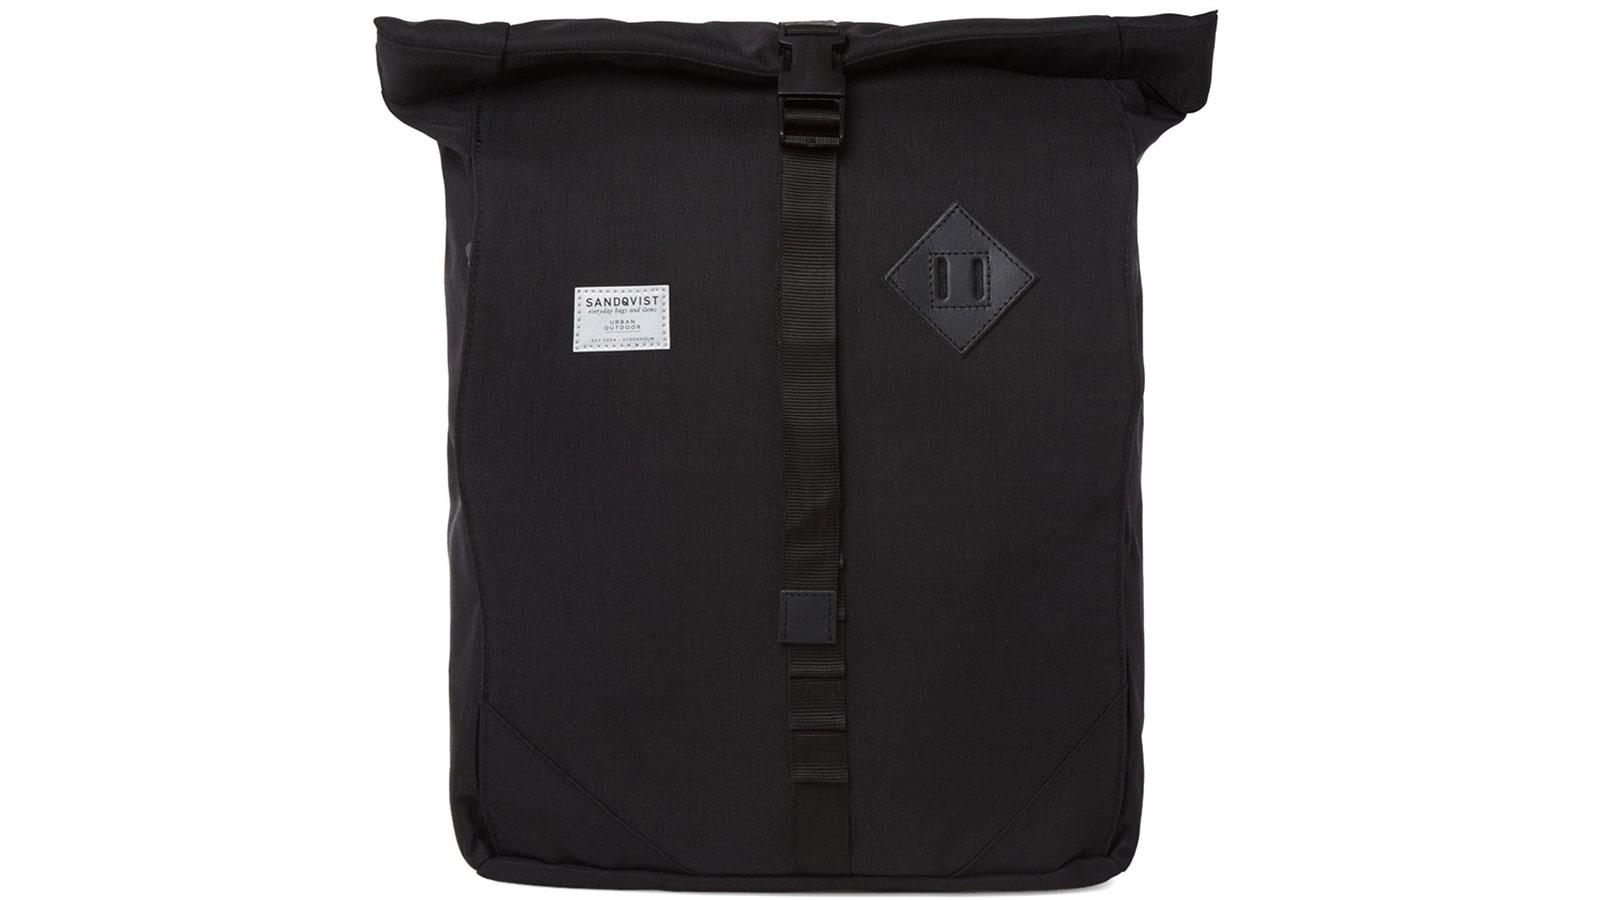 Sandqvist Eddy Rolltop | best rolltop backpacks